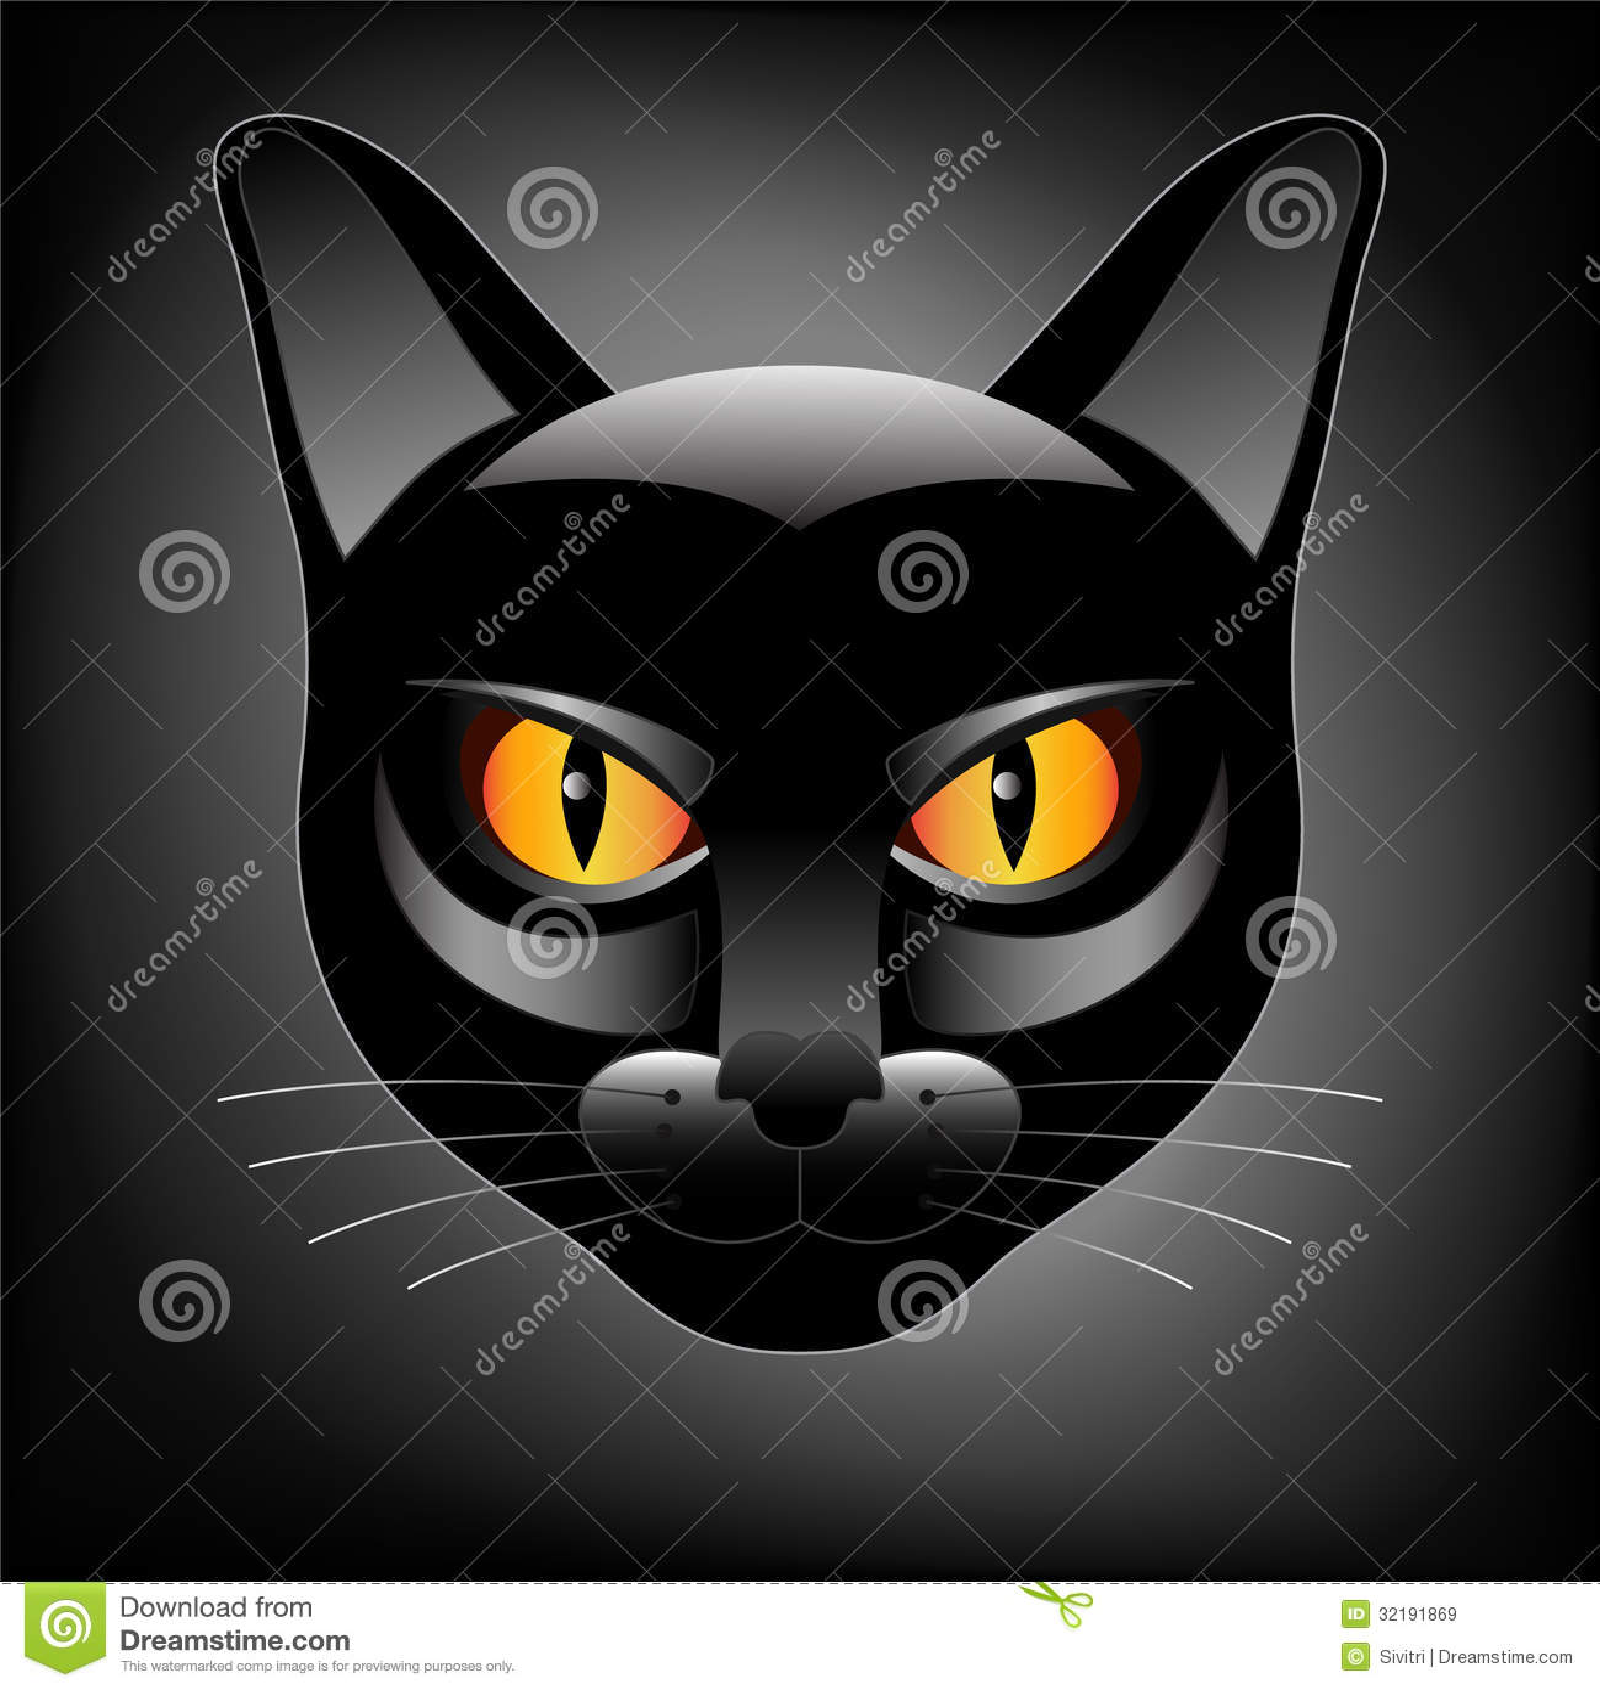 Halloween Black Cat Head Logo Royalty Free Stock Images